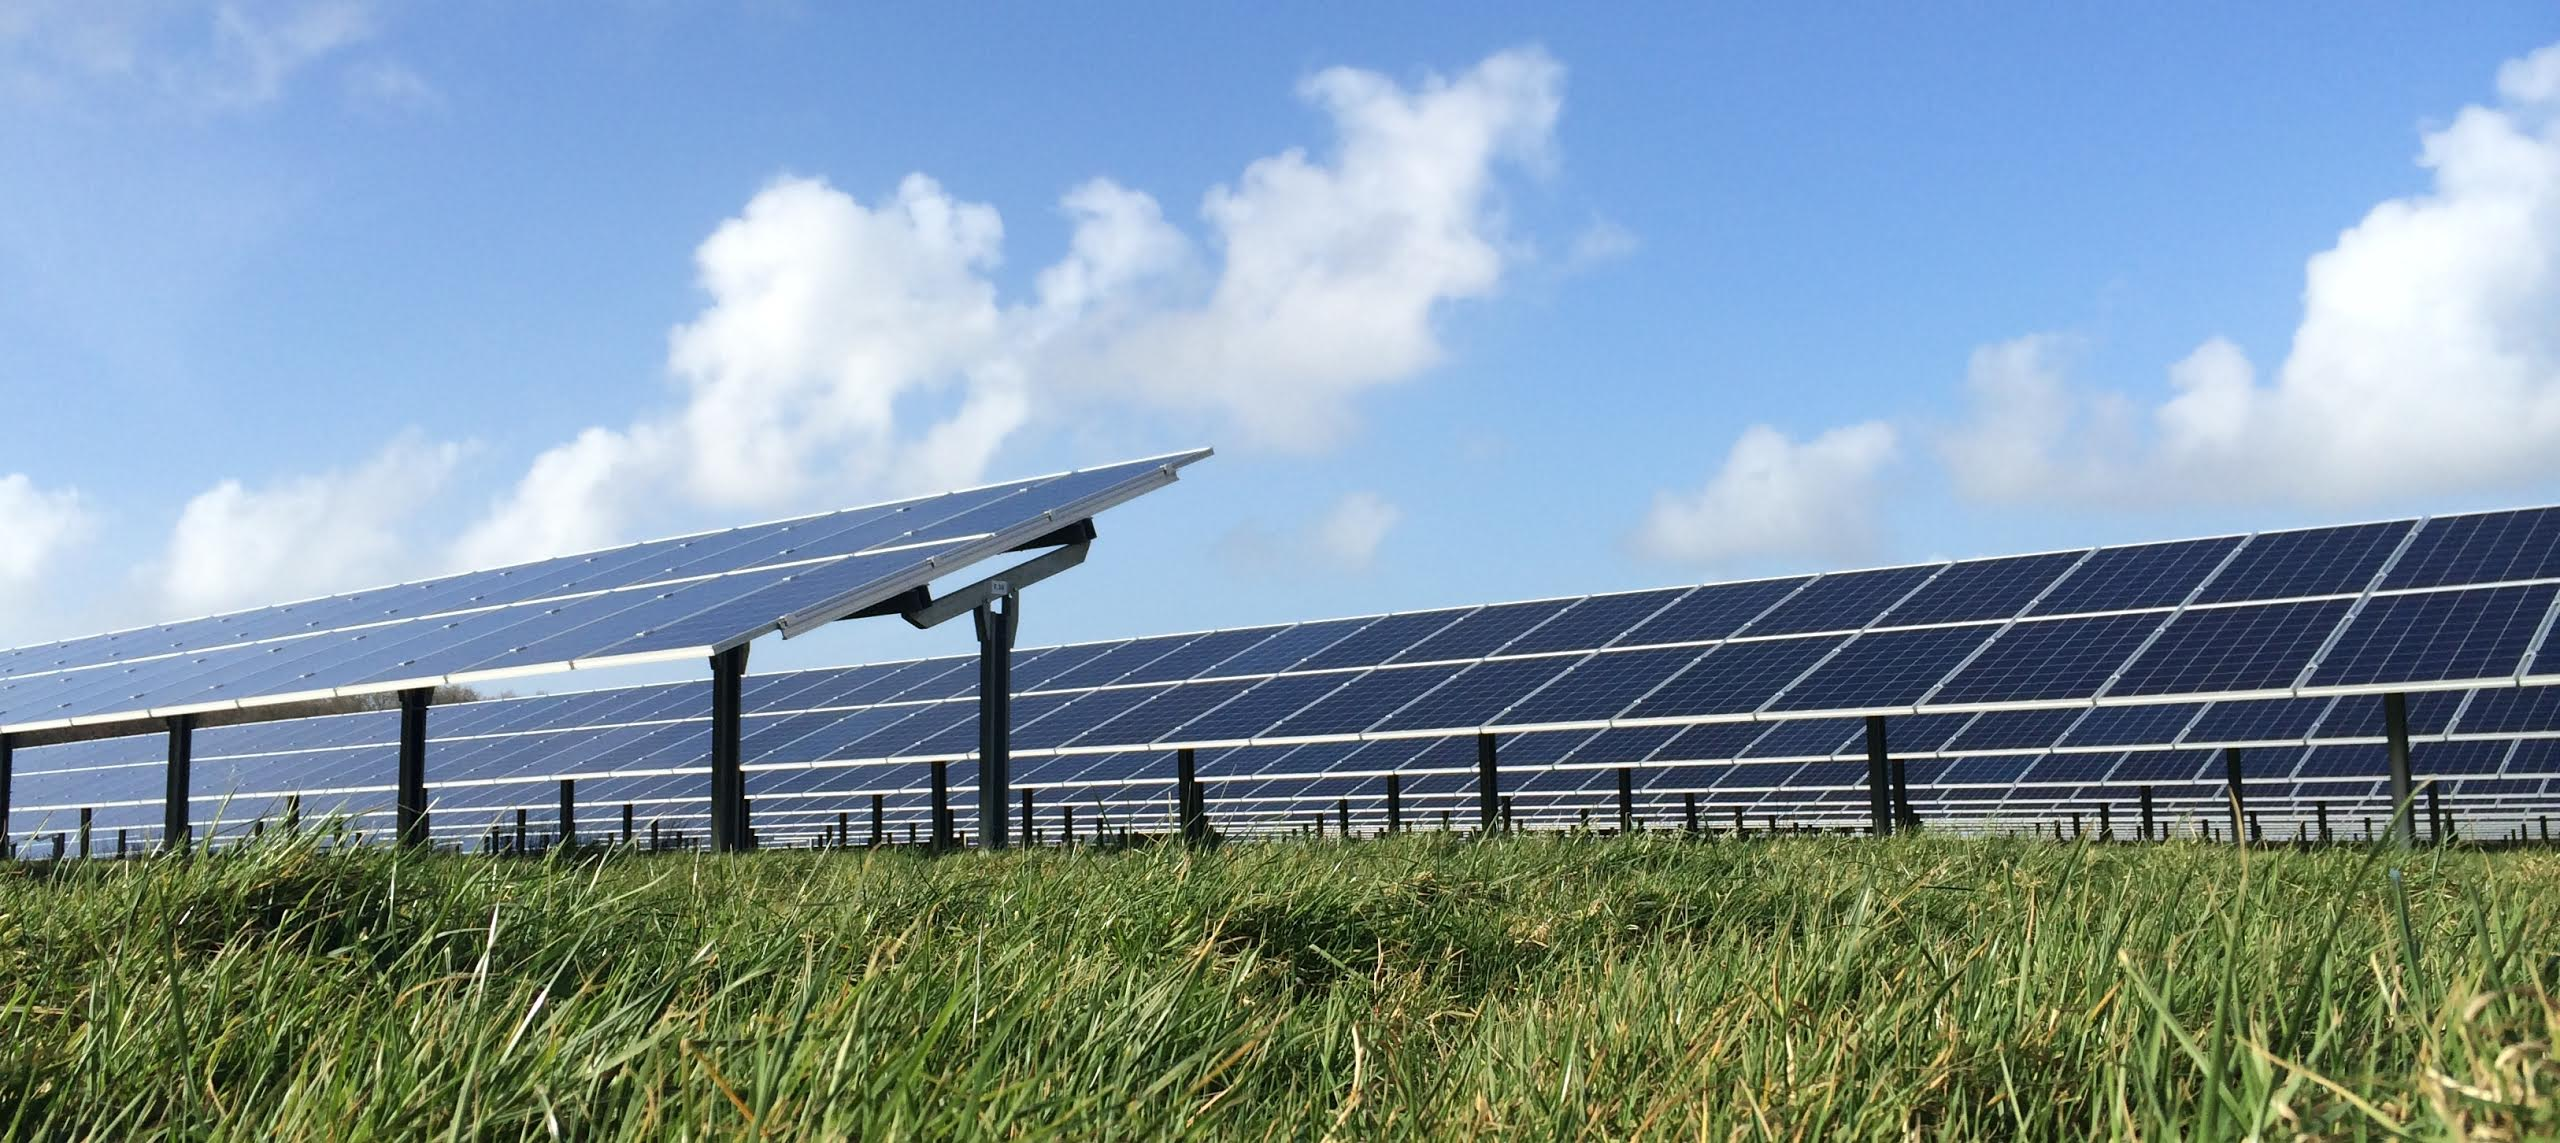 horsacott farm solar farm green energy drawings